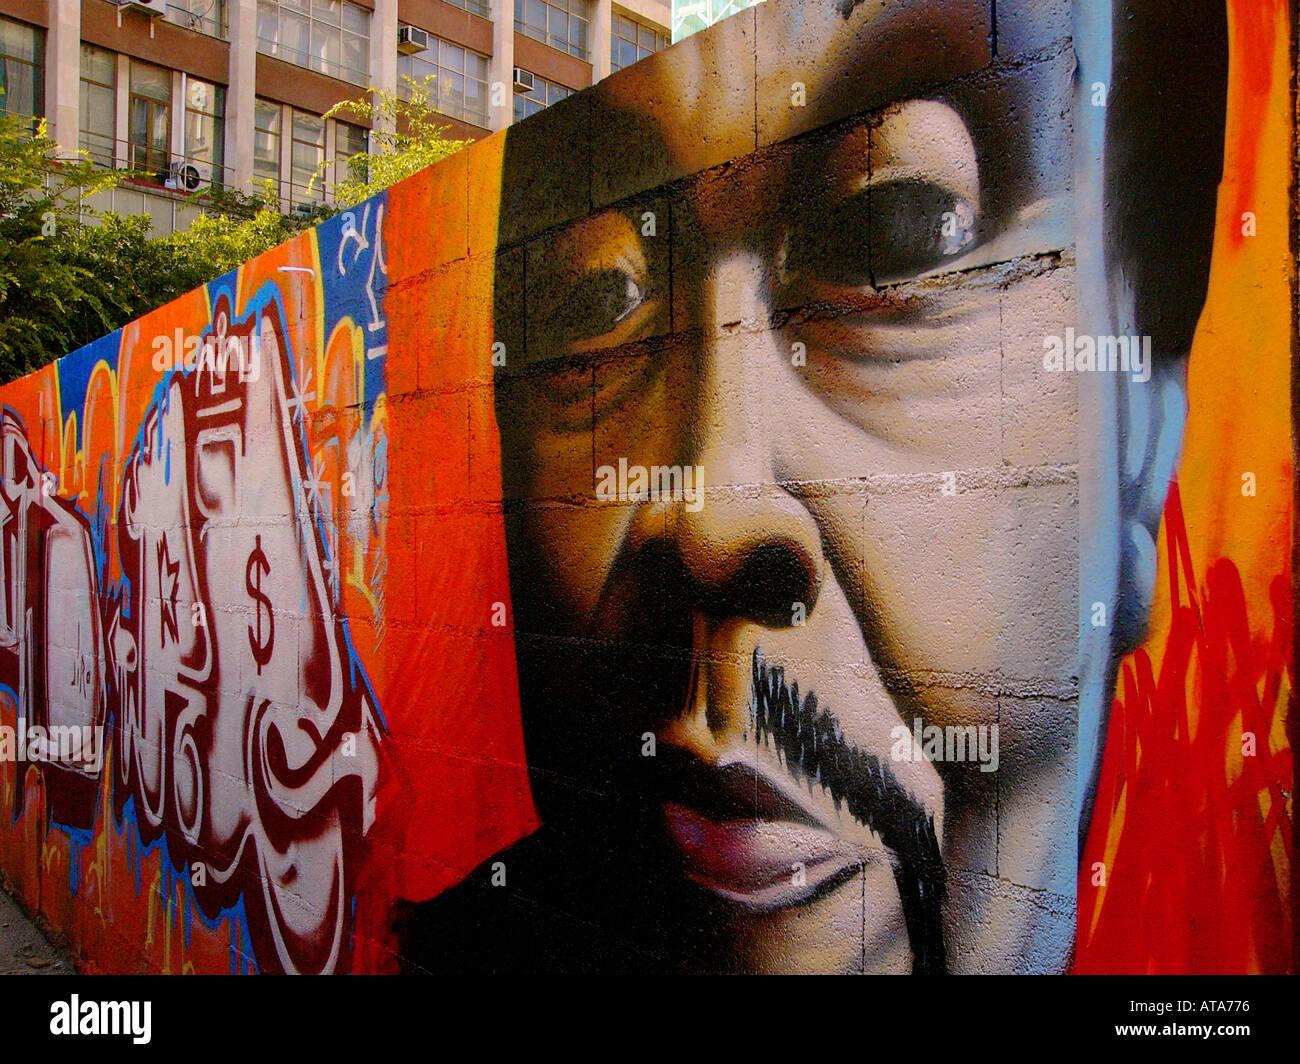 Graffitti Wall Barcelona Spain - Stock Image